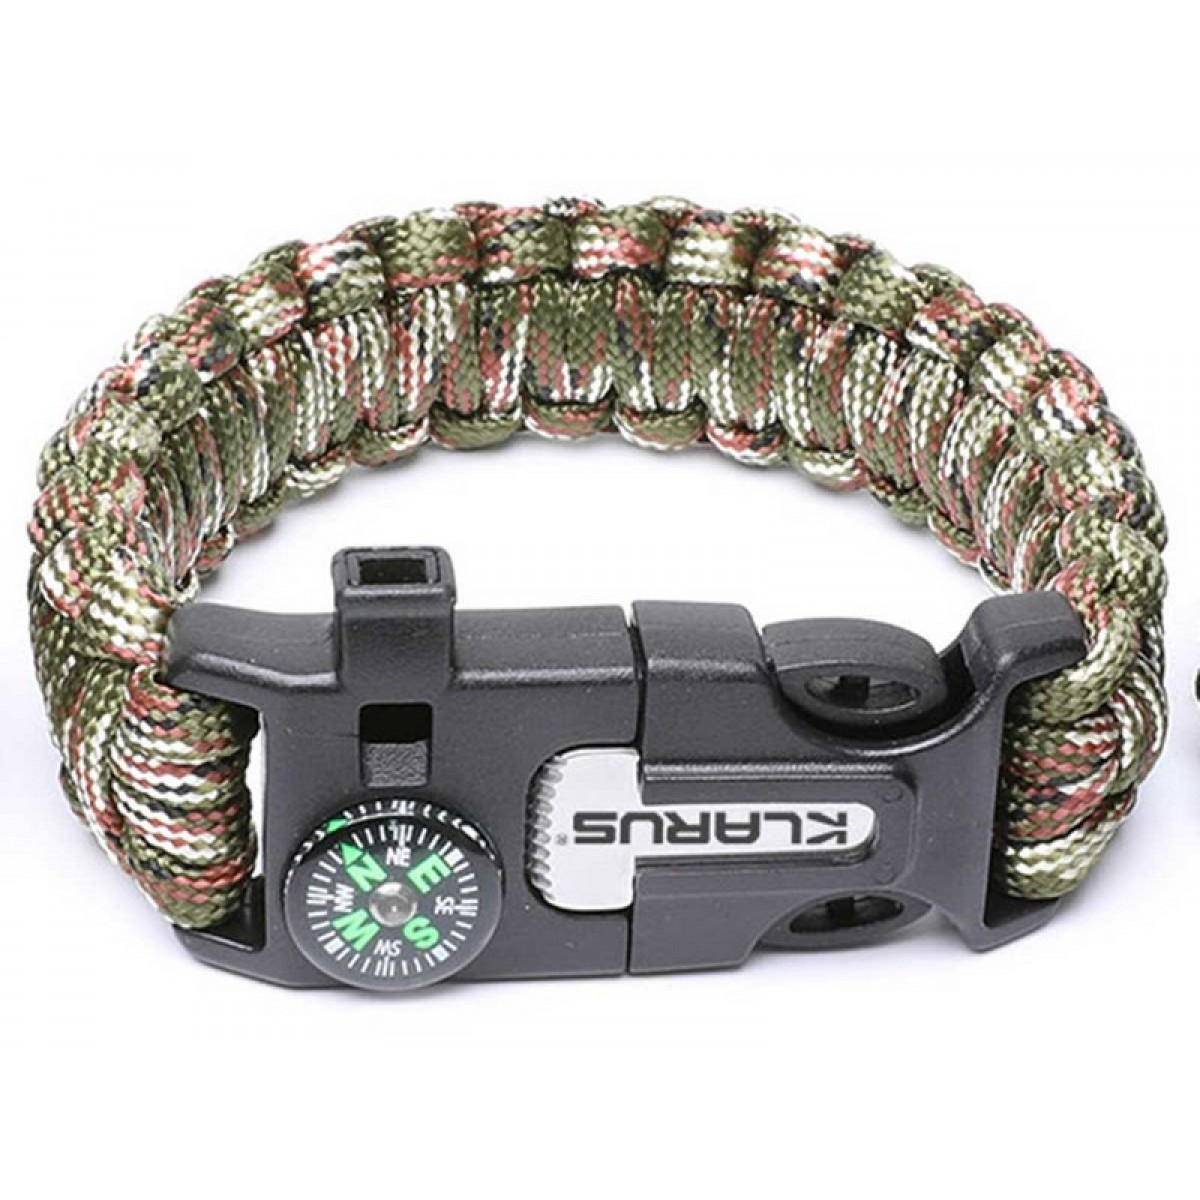 Klarus 5 in 1 Paracord Survival Bracelet  Multitool Army Green